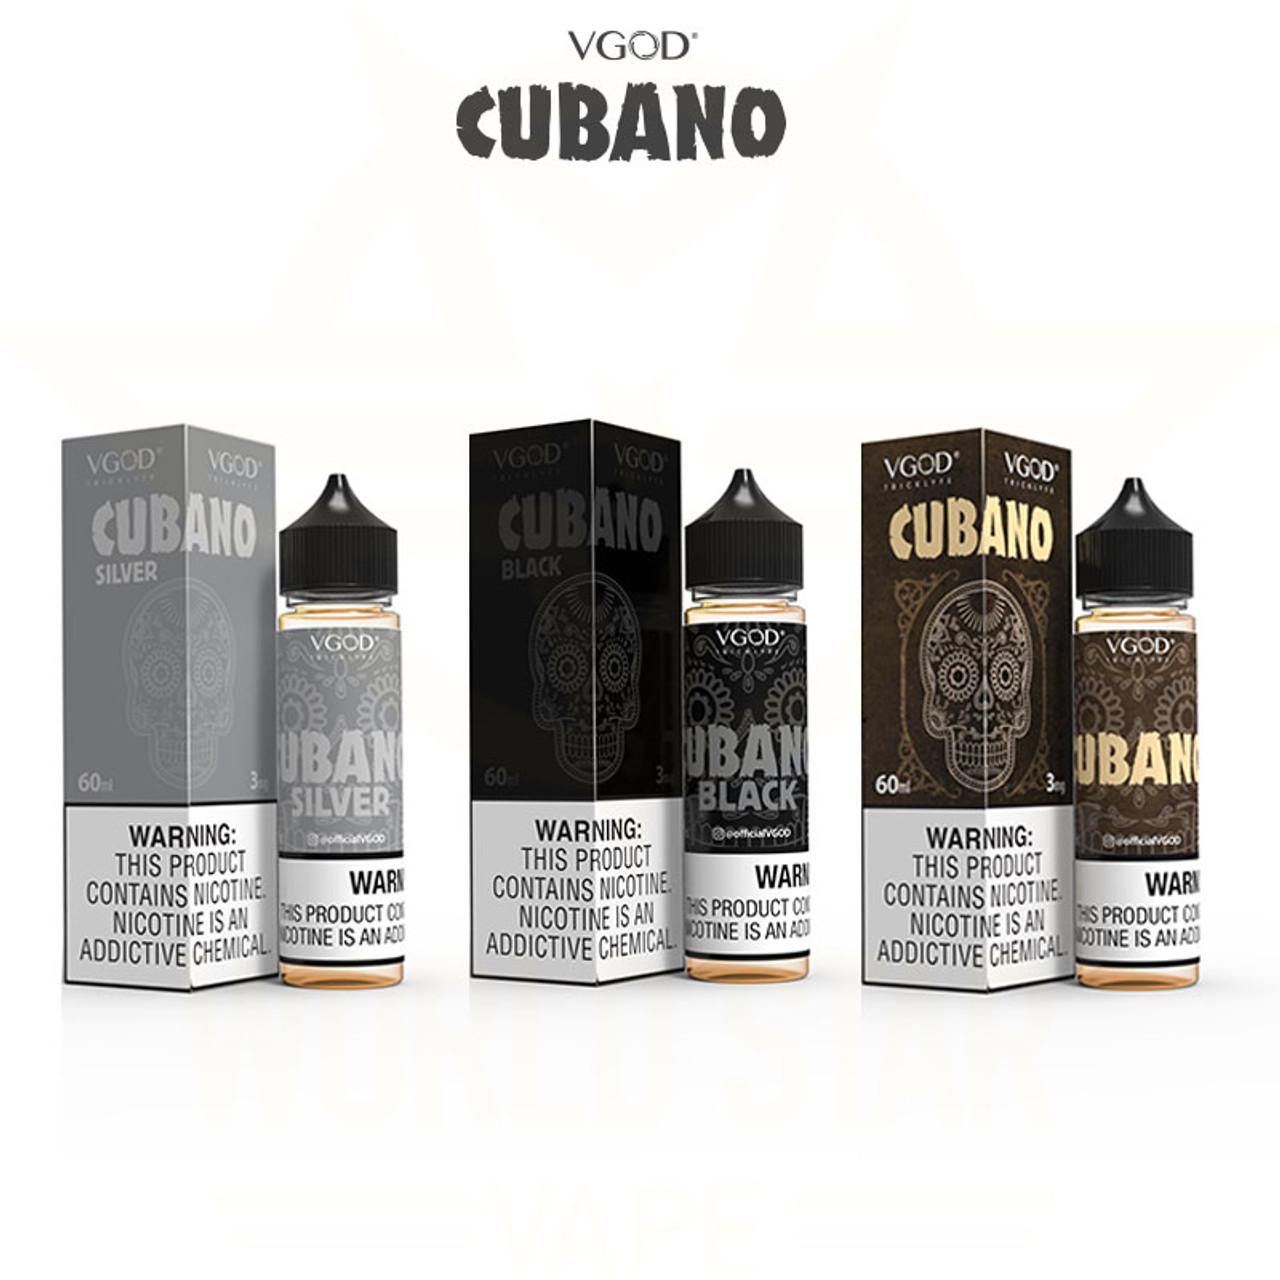 VGOD Cigar Series eliquid Wholesale - worldstarvape